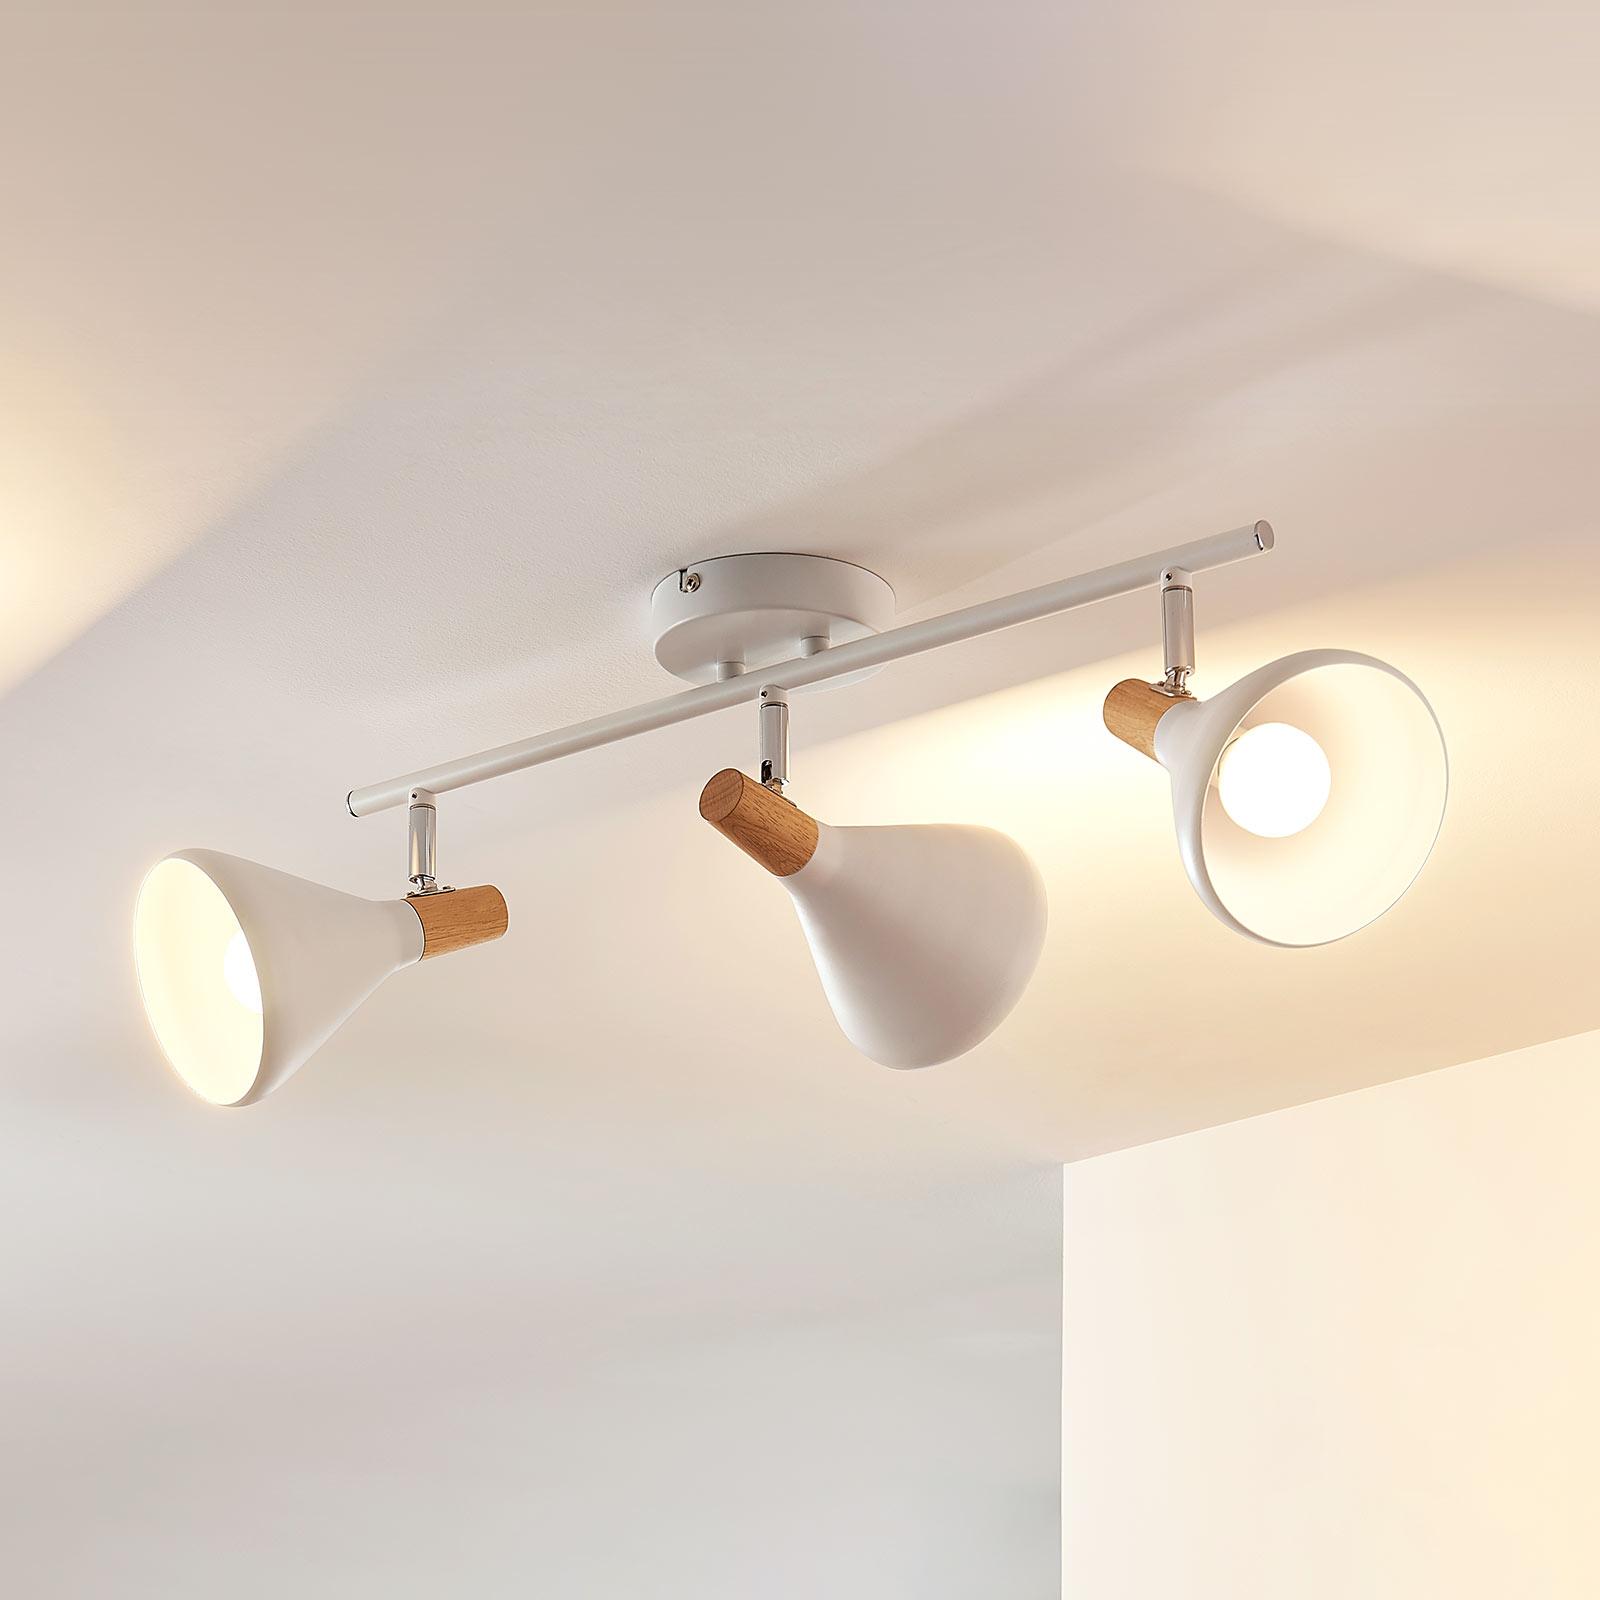 Arina - plafonnier LED blanc à trois lampes